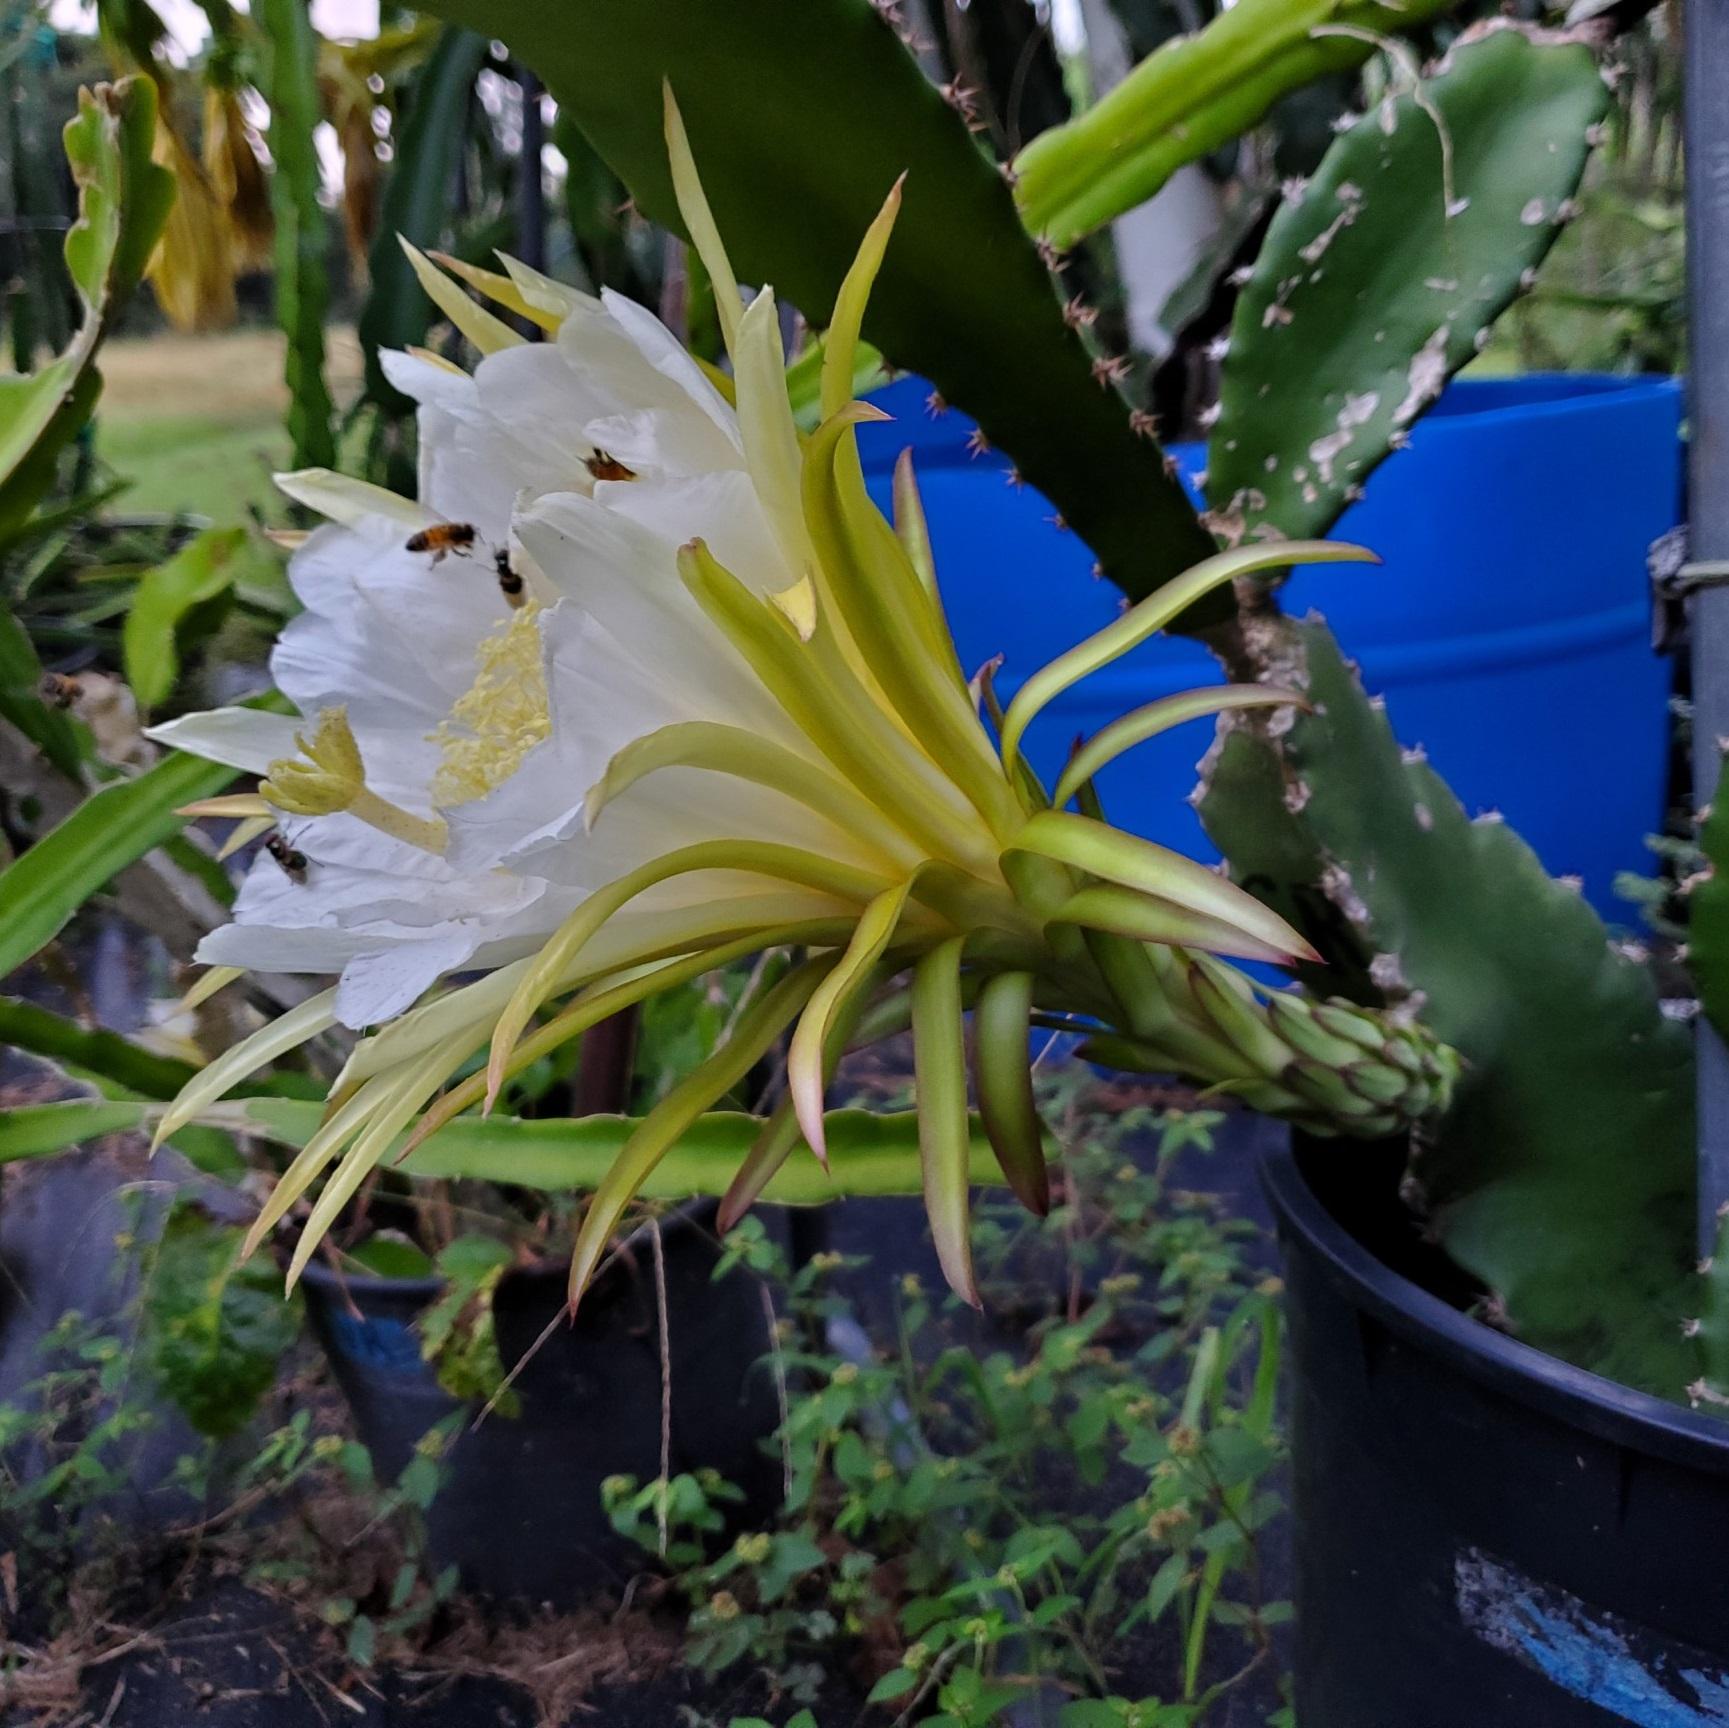 Costa Rican Sunset Dragon Fruit Flower